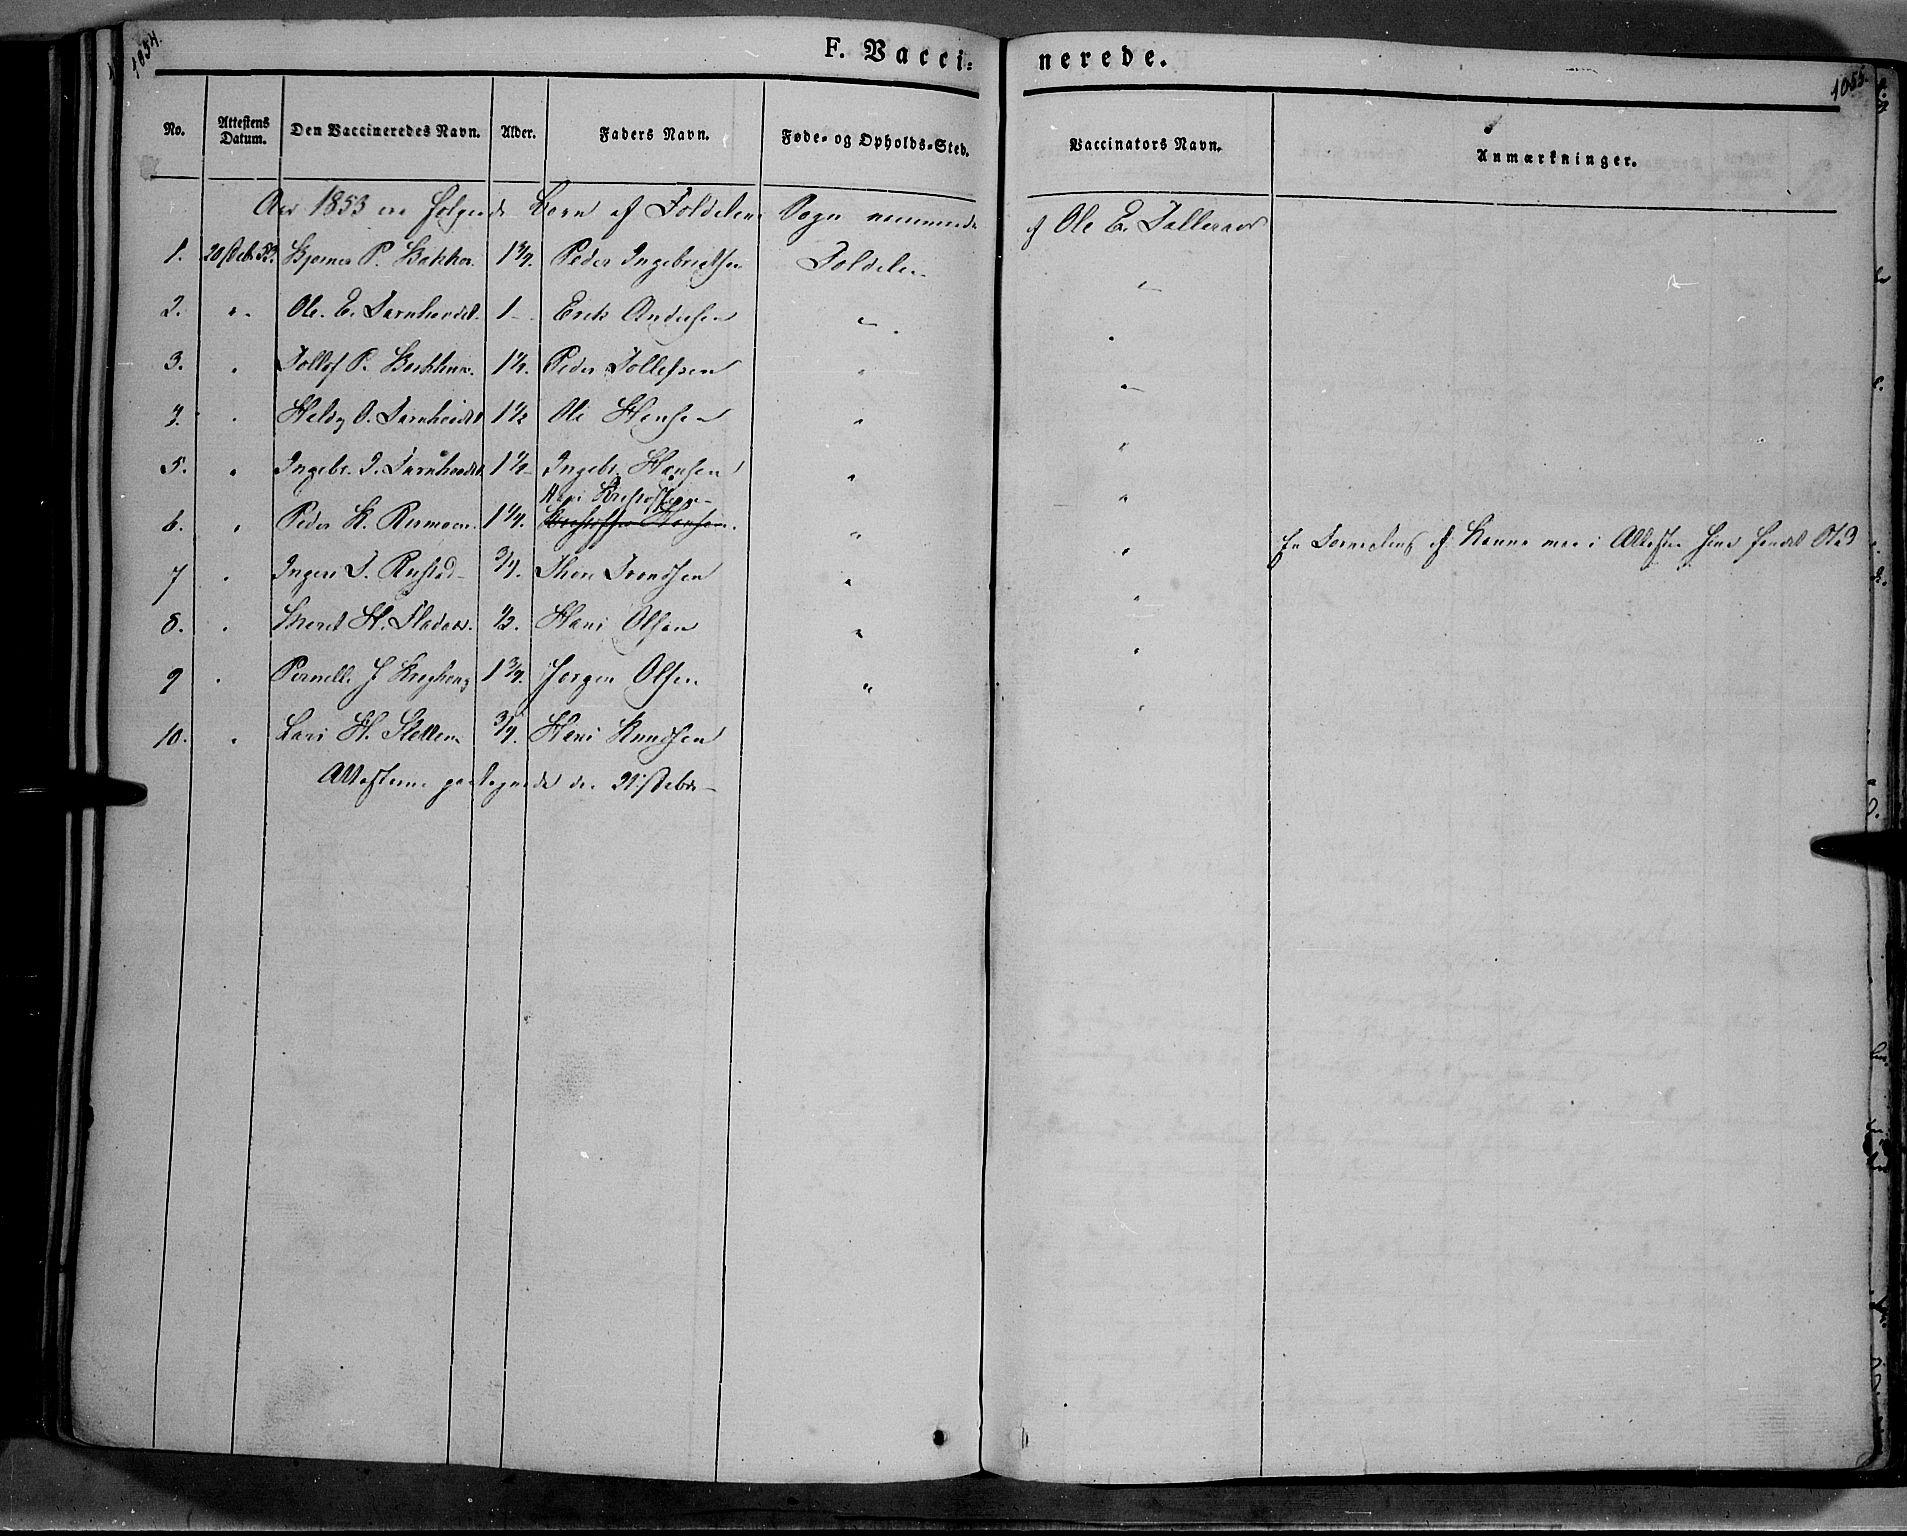 SAH, Lesja prestekontor, Ministerialbok nr. 6B, 1843-1854, s. 1054-1055